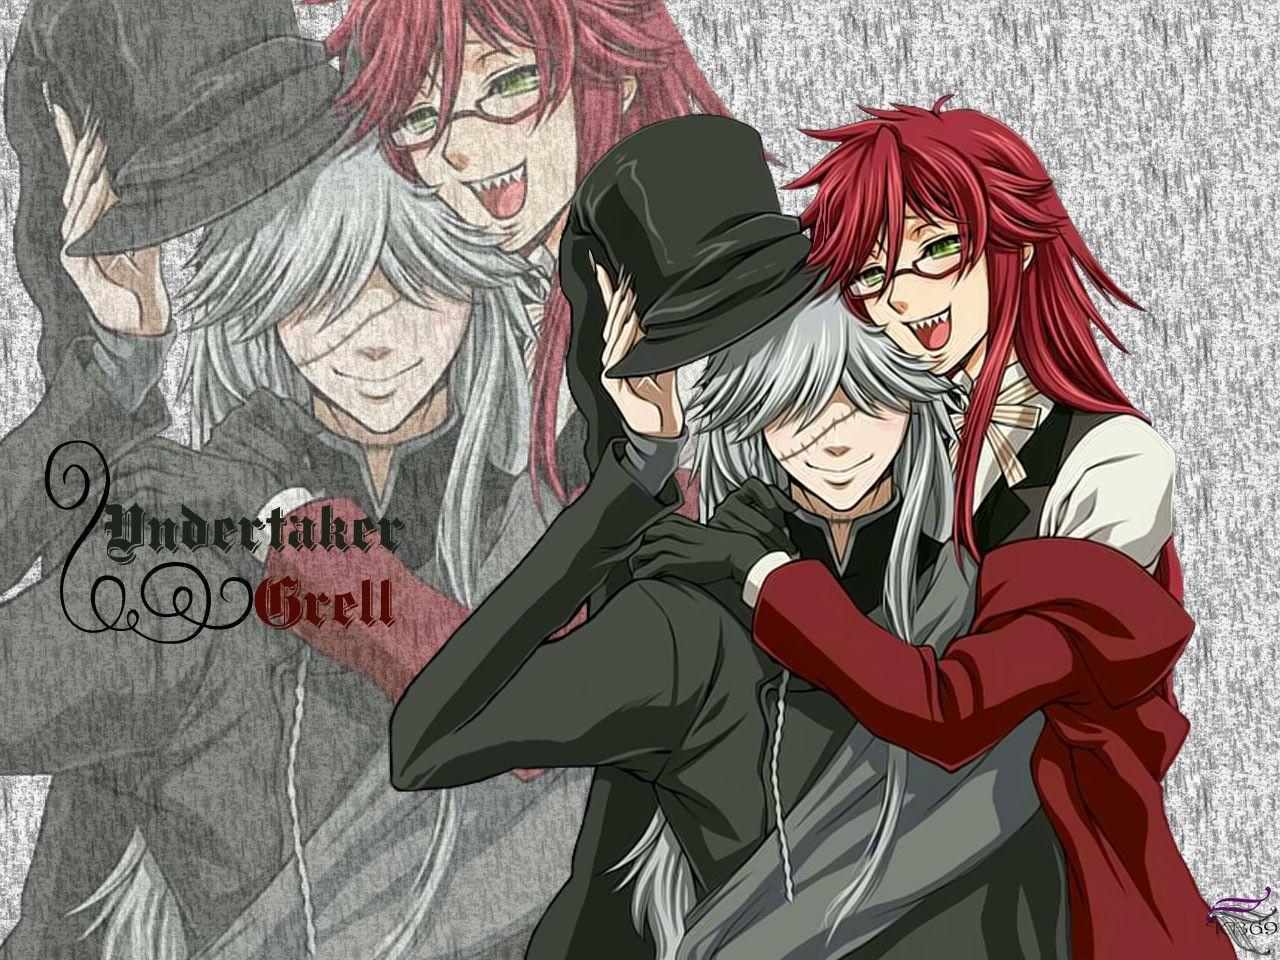 Undertaker From Kuroshitsuji Wallpaper 22756387